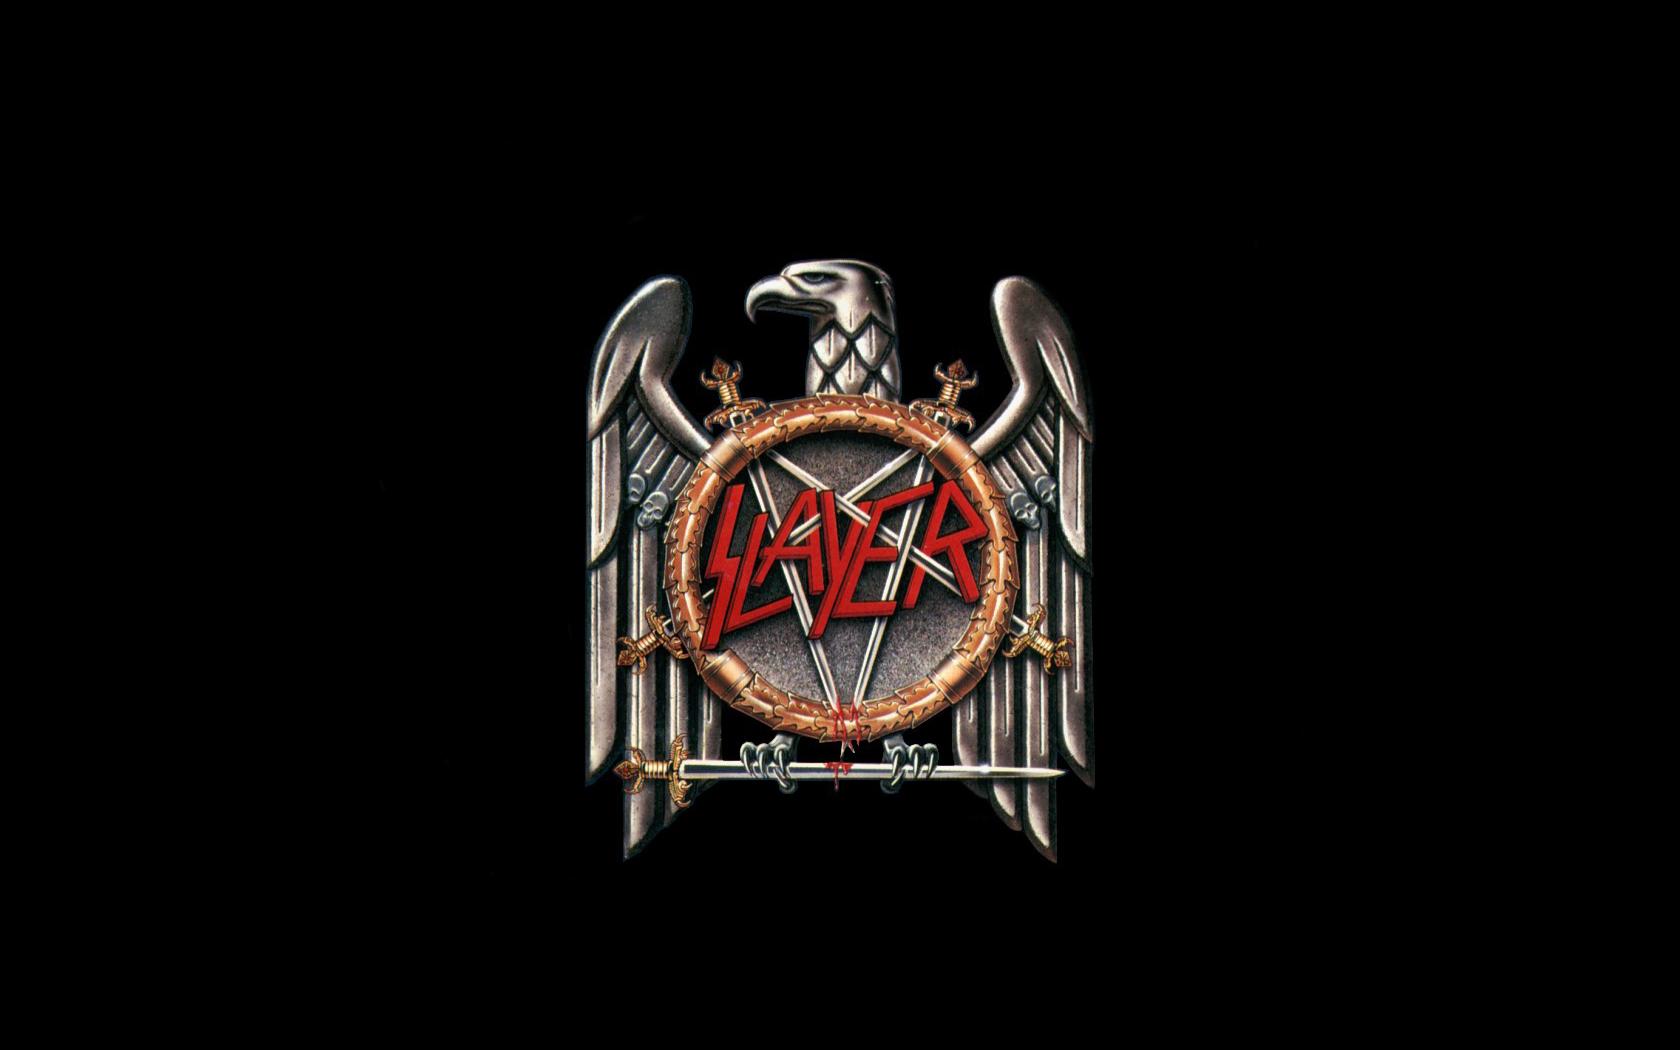 Slayer Computer Wallpapers Desktop Backgrounds 1680x1050 ID74672 1680x1050